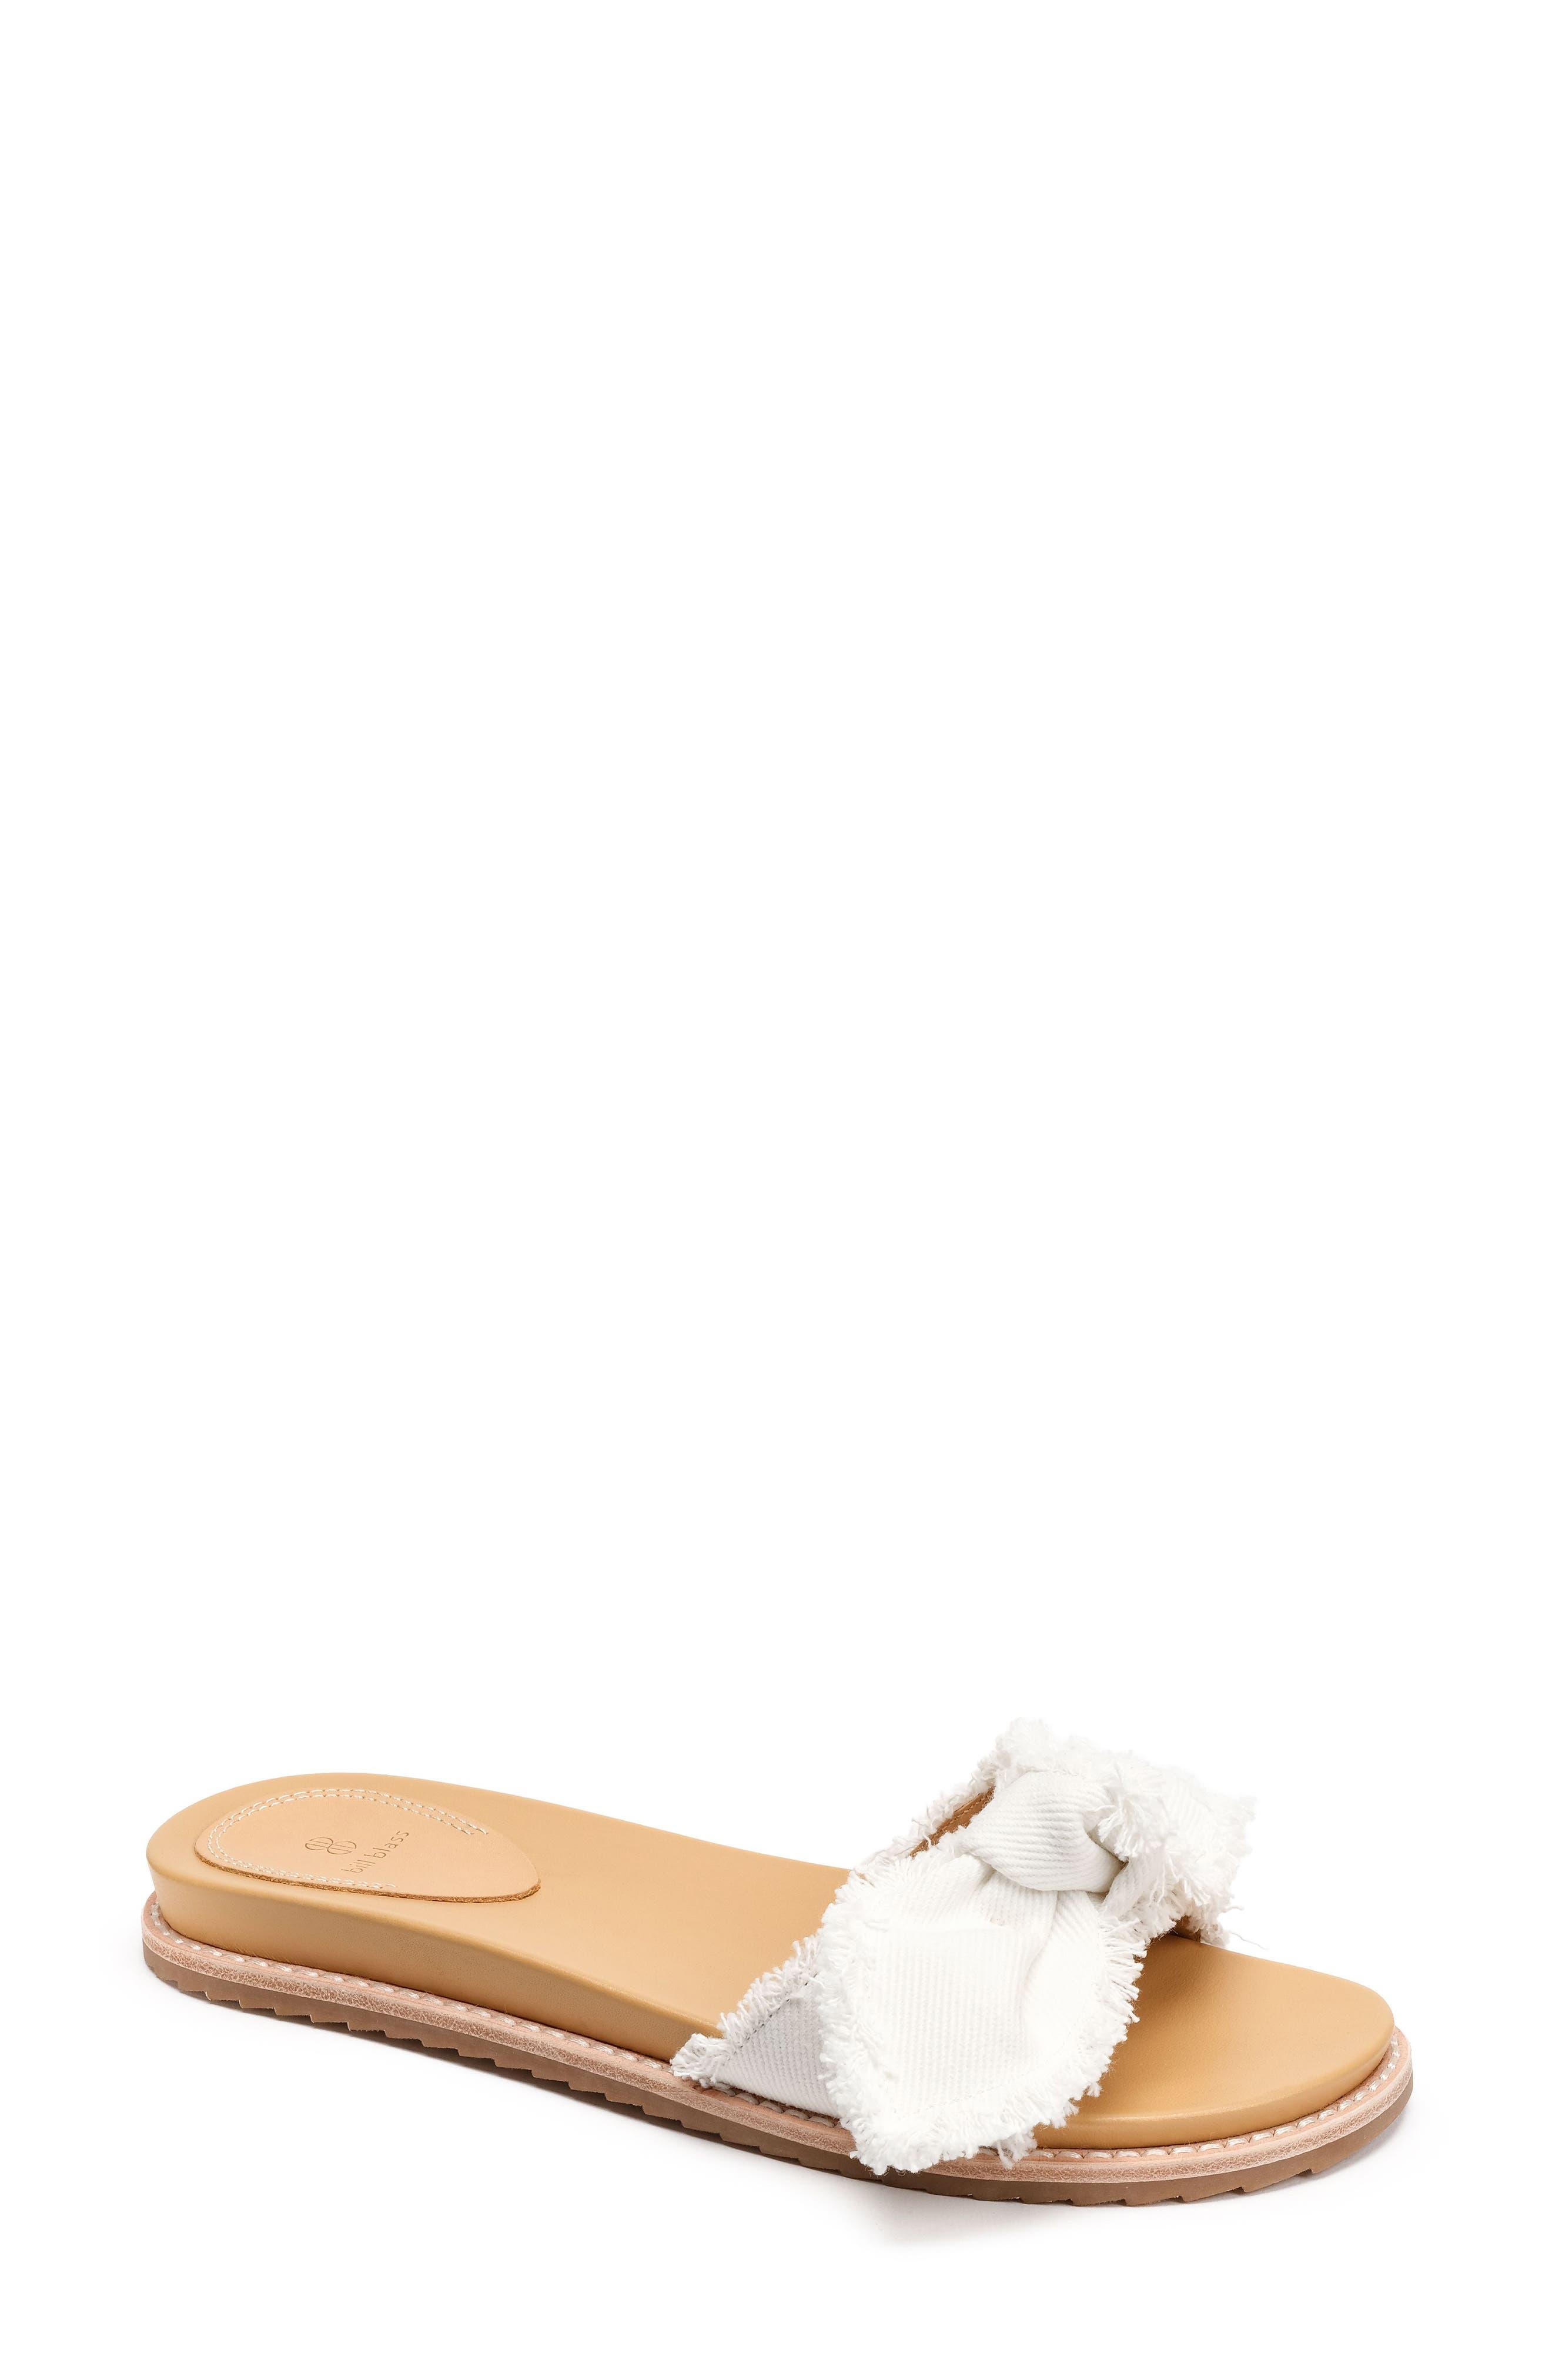 Carmela Slide Sandal,                             Main thumbnail 1, color,                             White Fabric